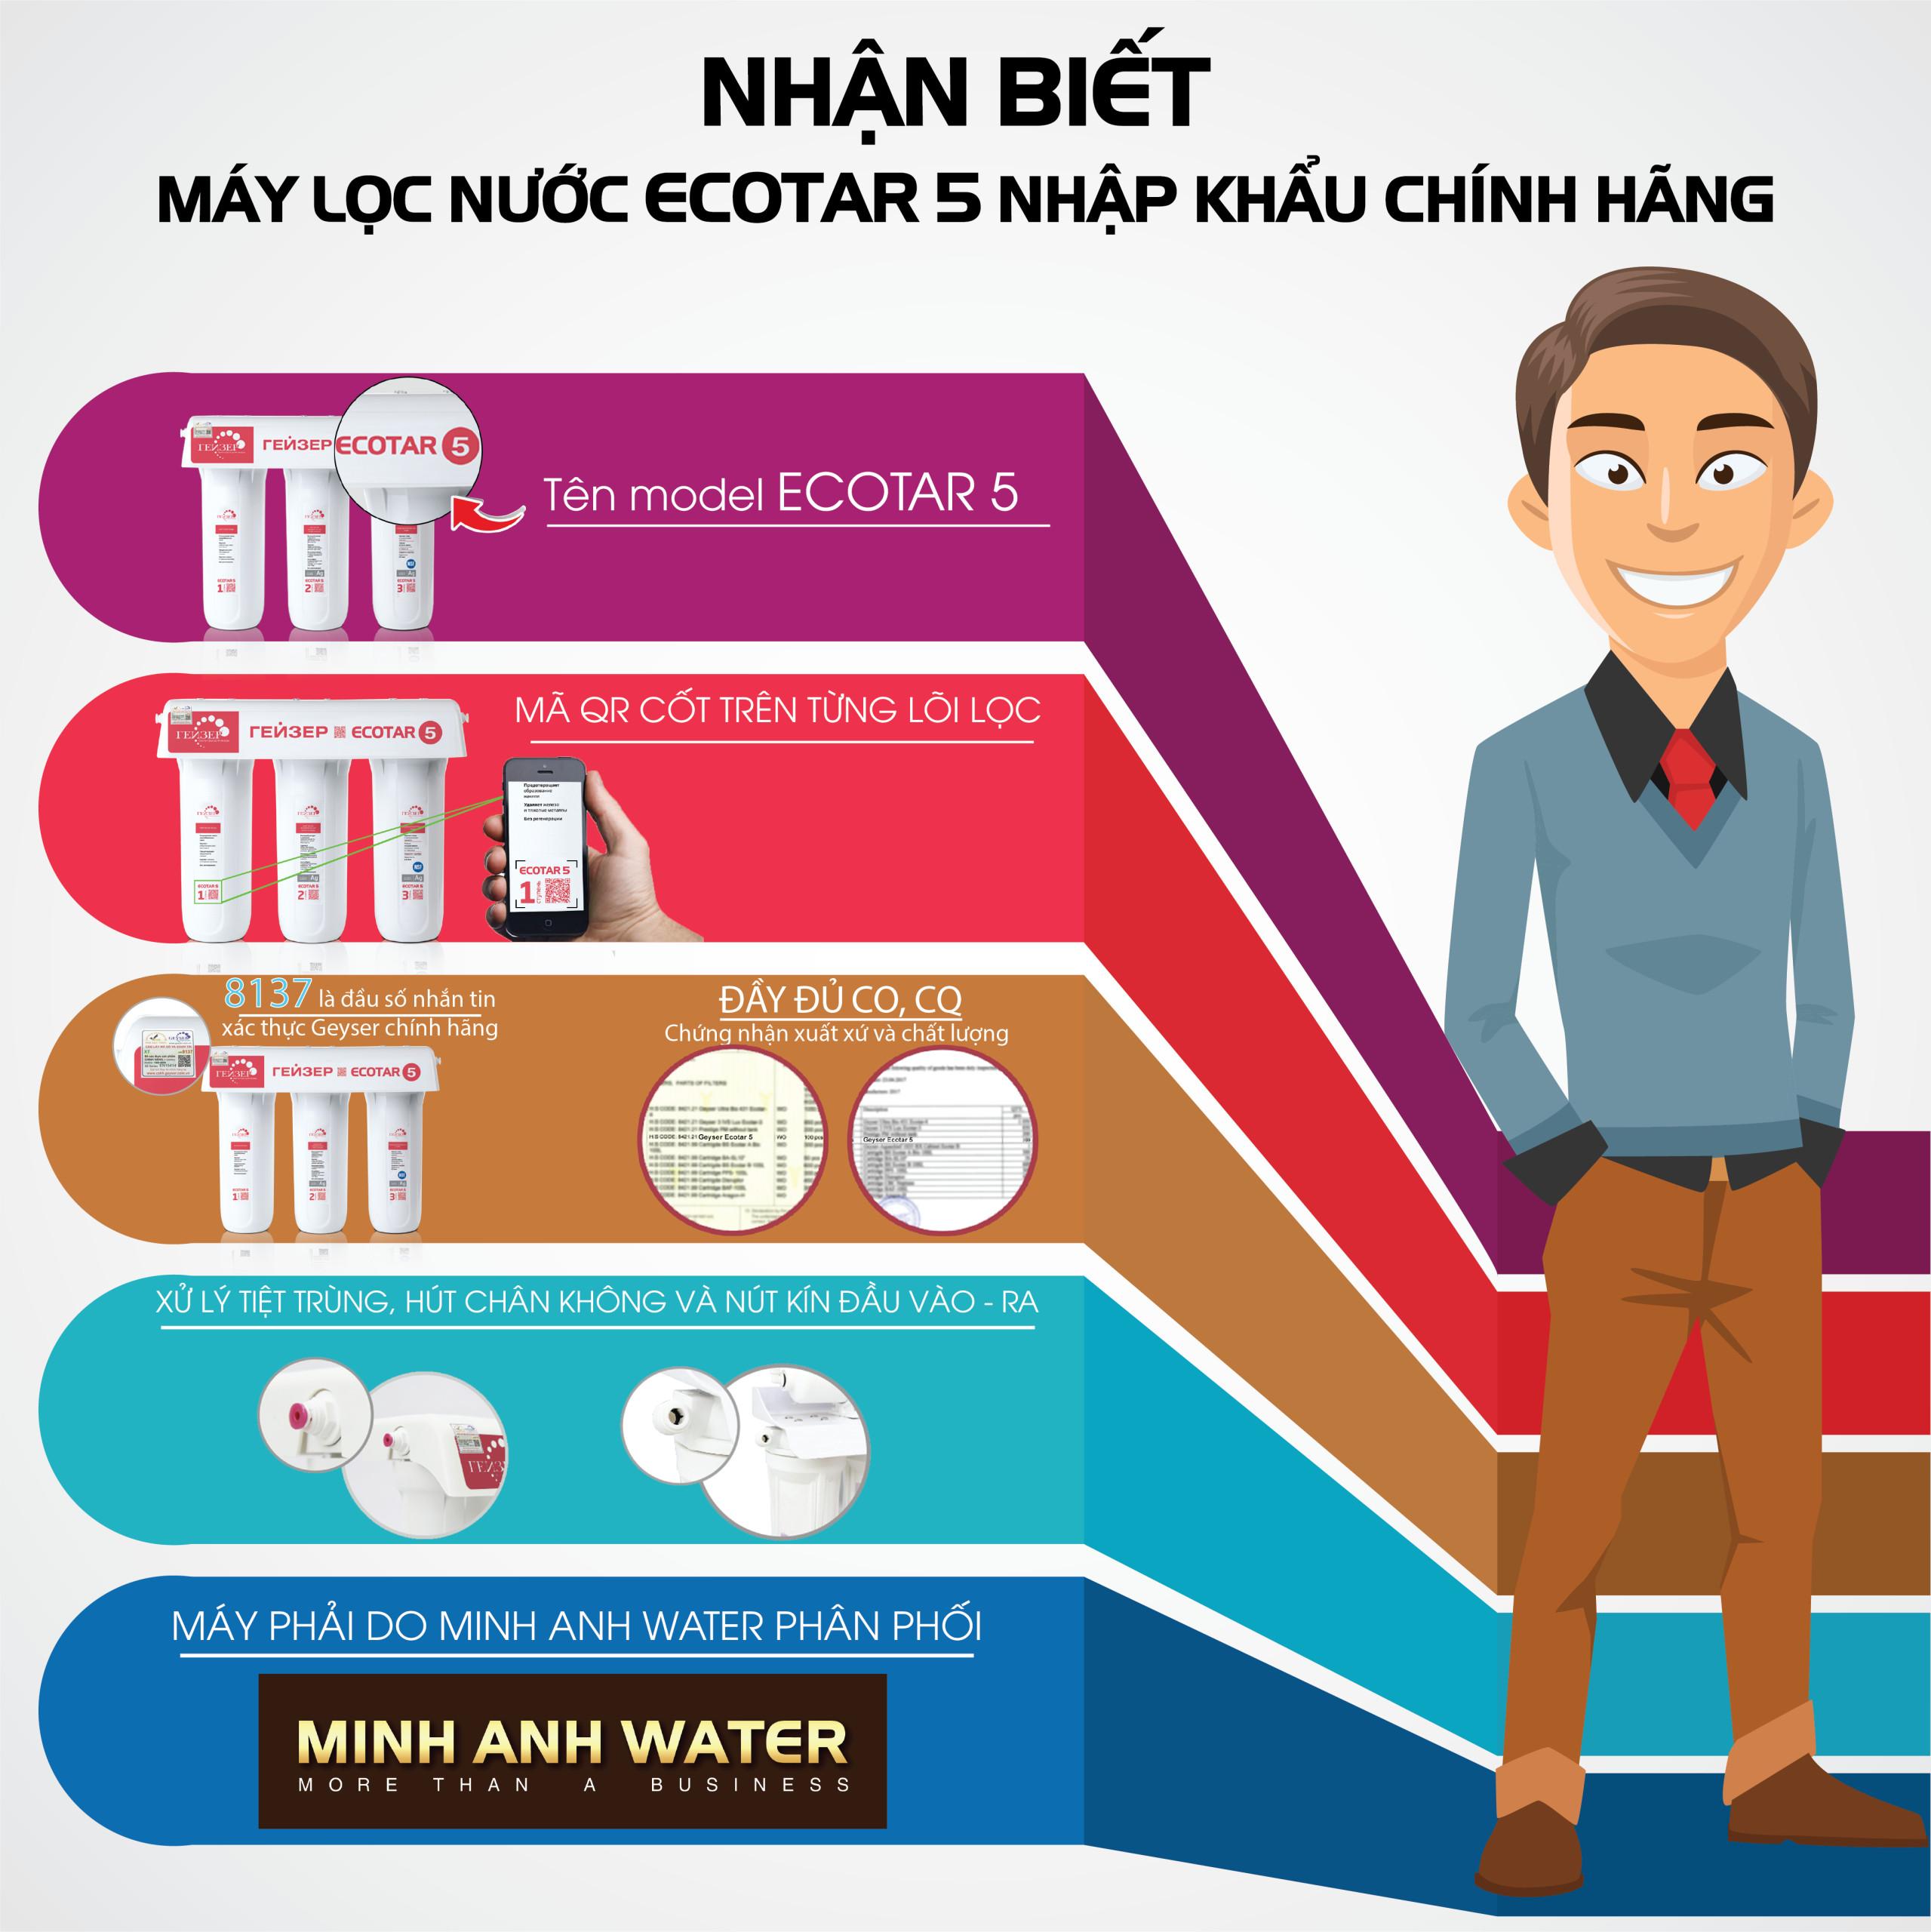 Nhận biết máy lọc nước Geyser Ecotar 5